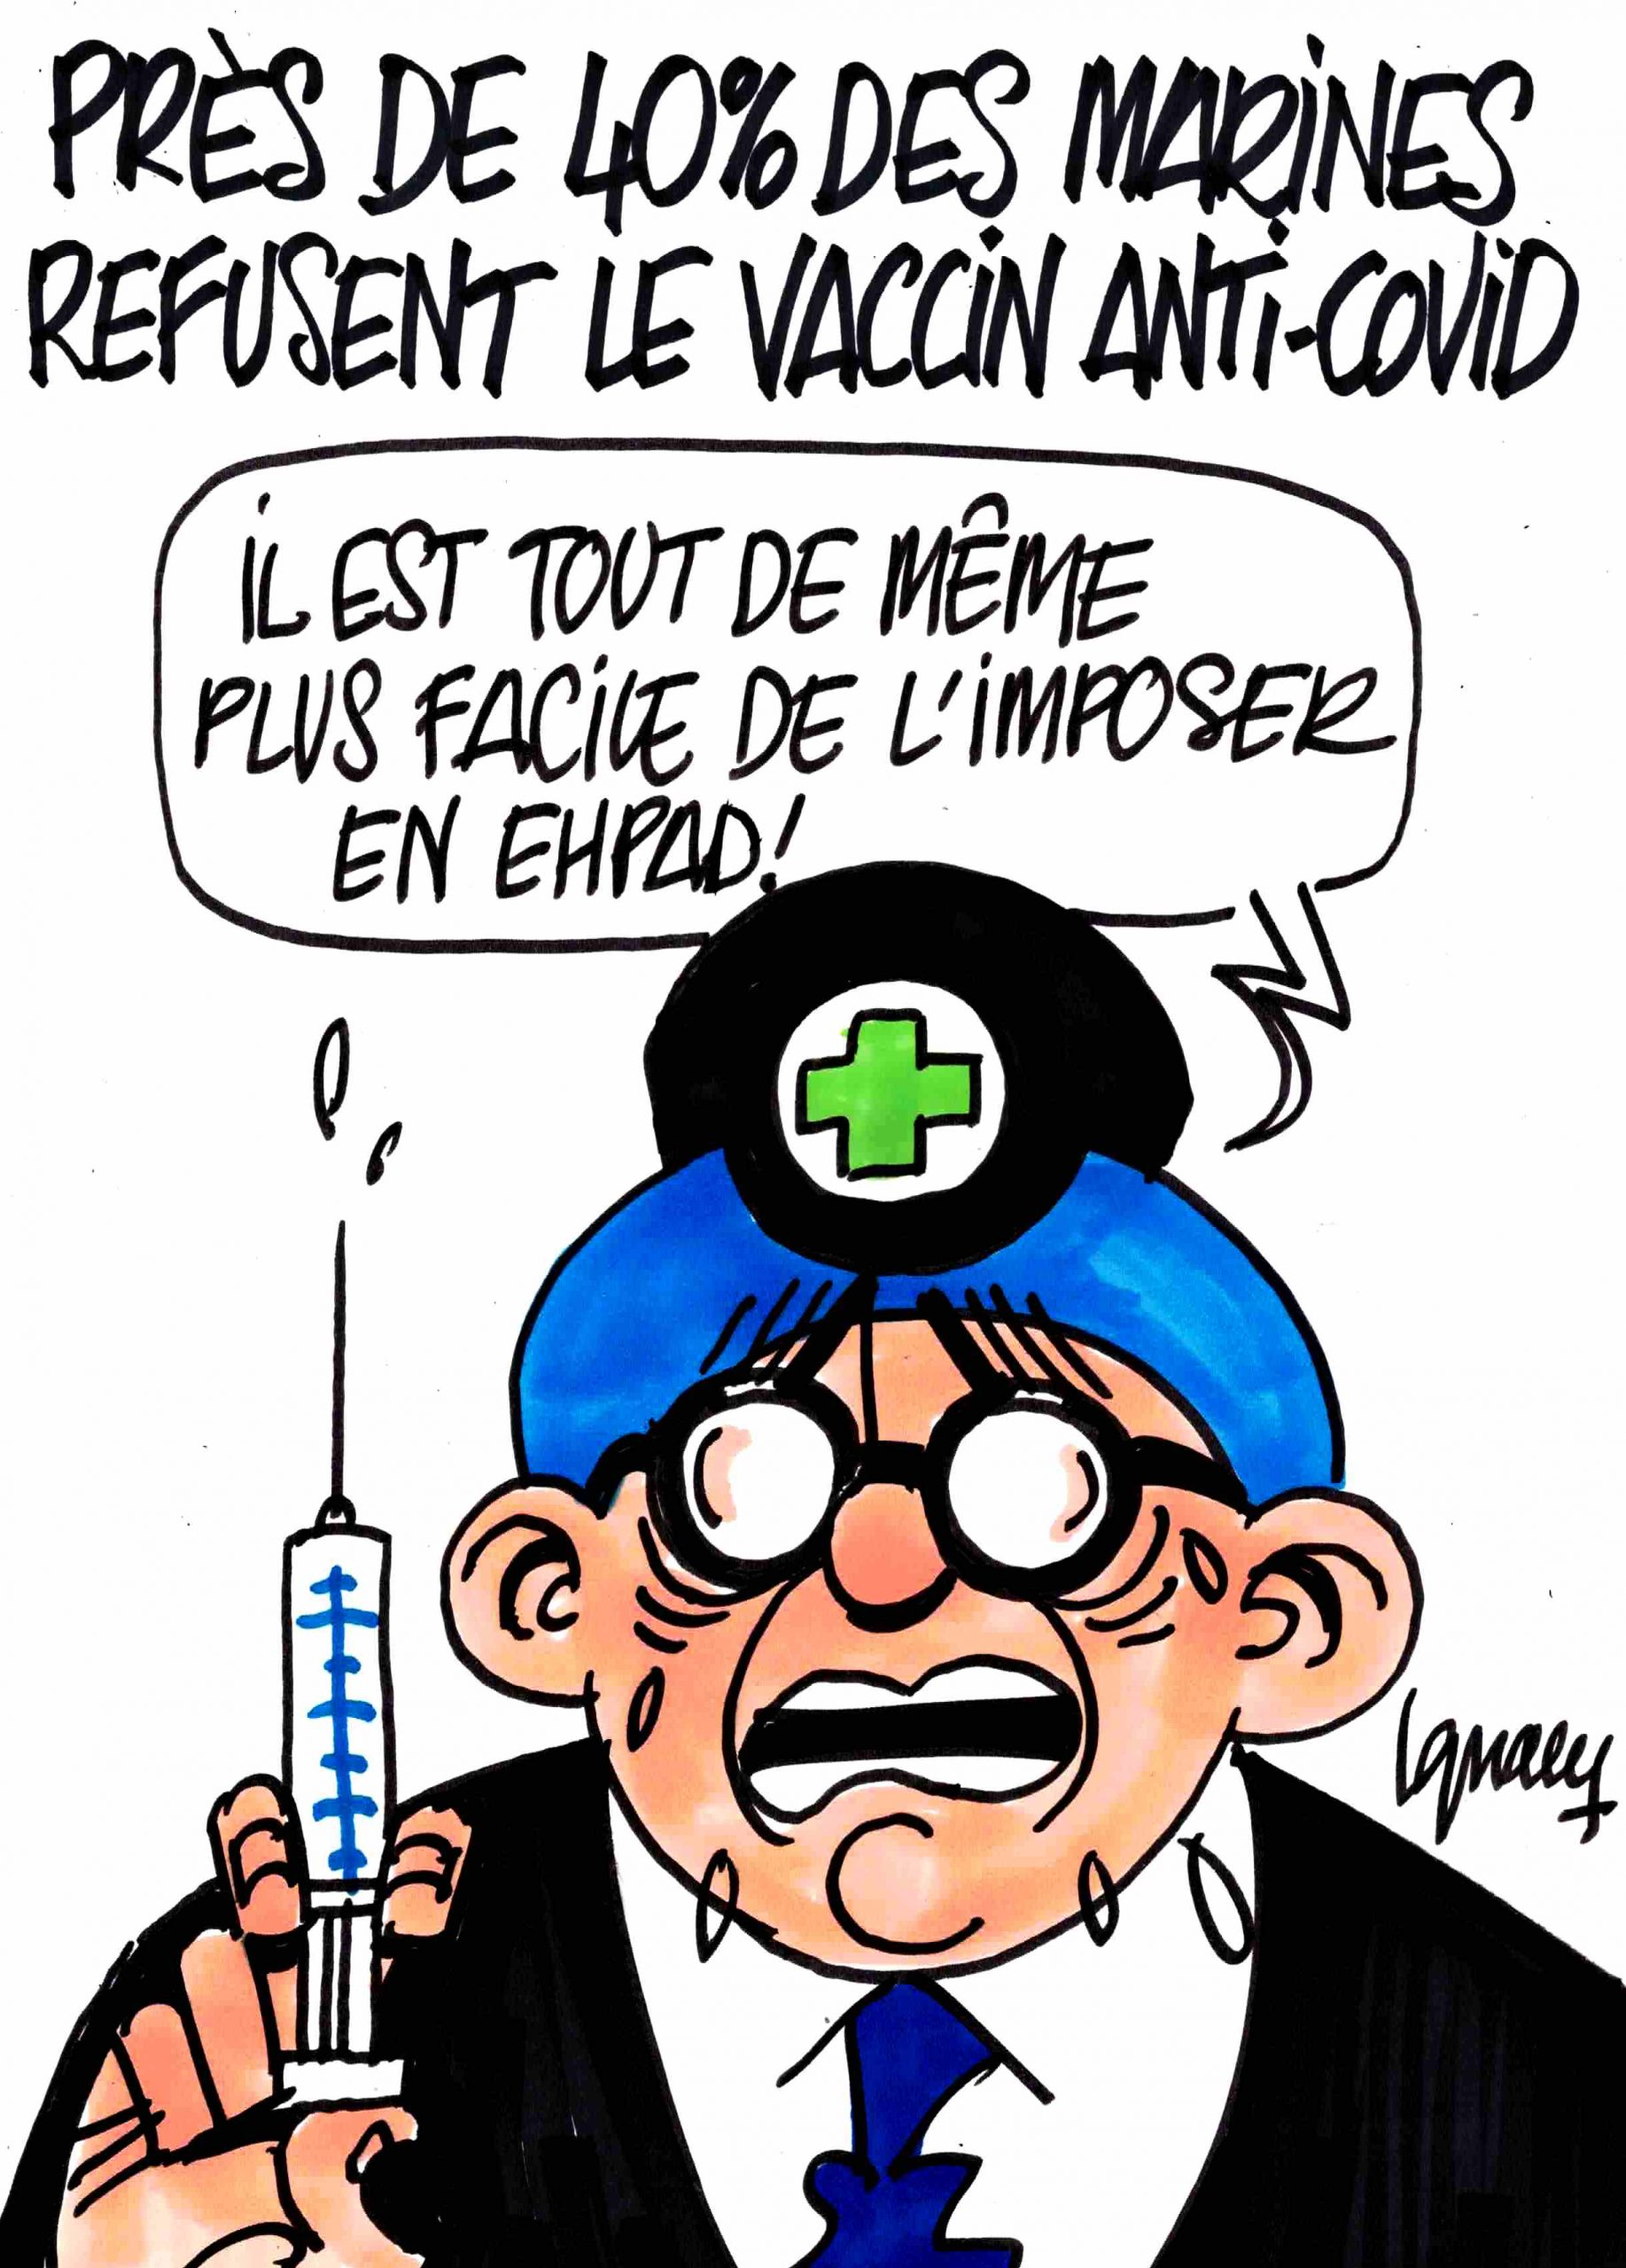 Ignace - Près de 40% des marines refusent le vaccin anti-covid